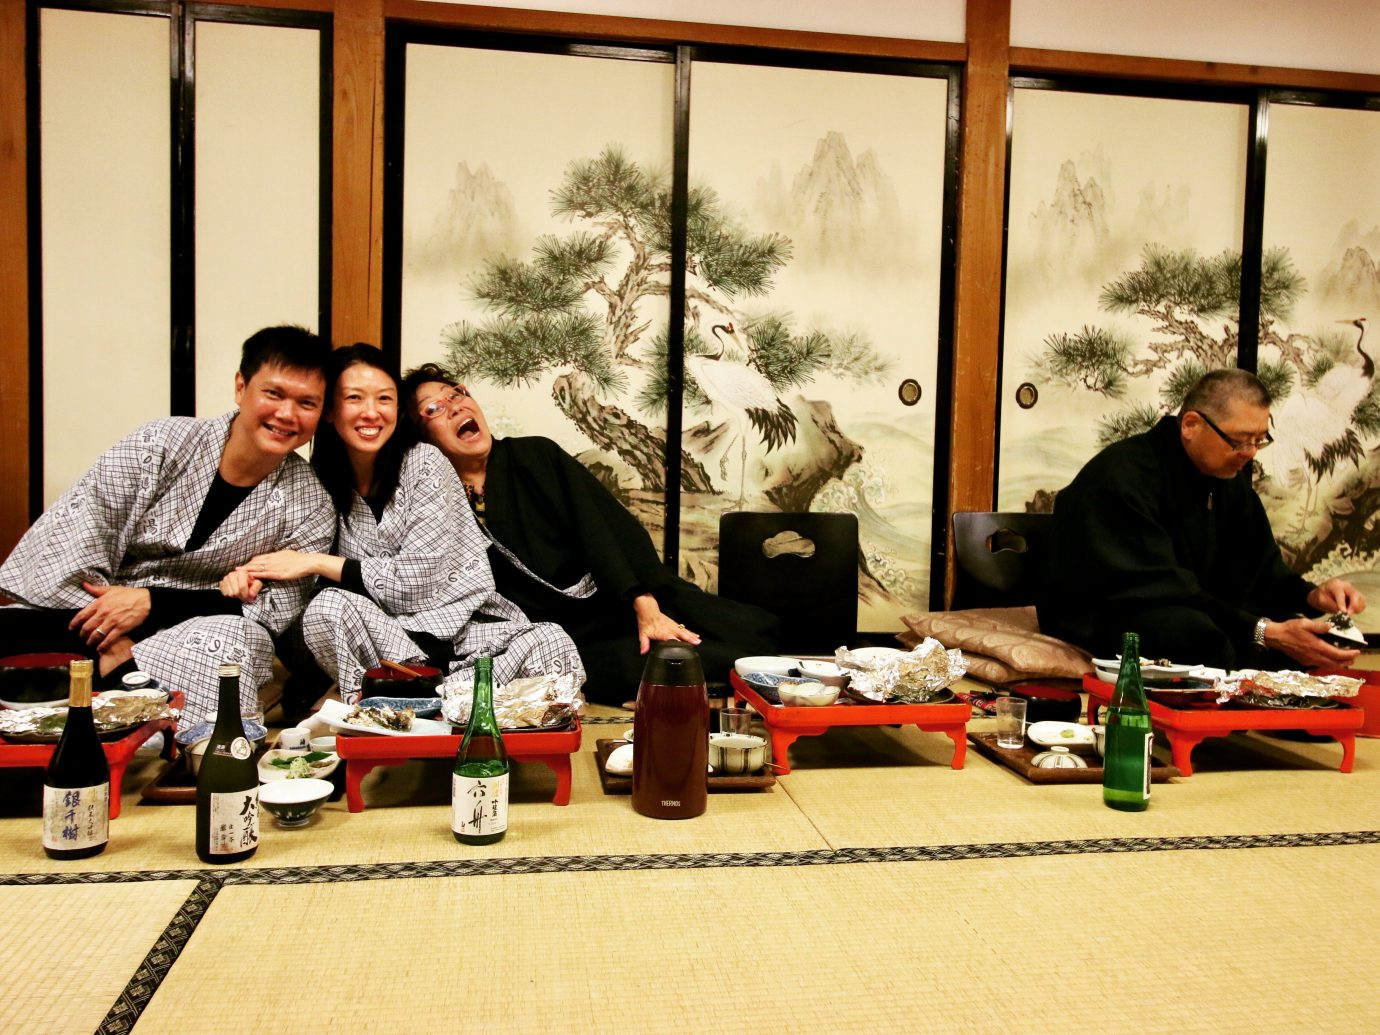 people eating dinner and drinking sake in japan